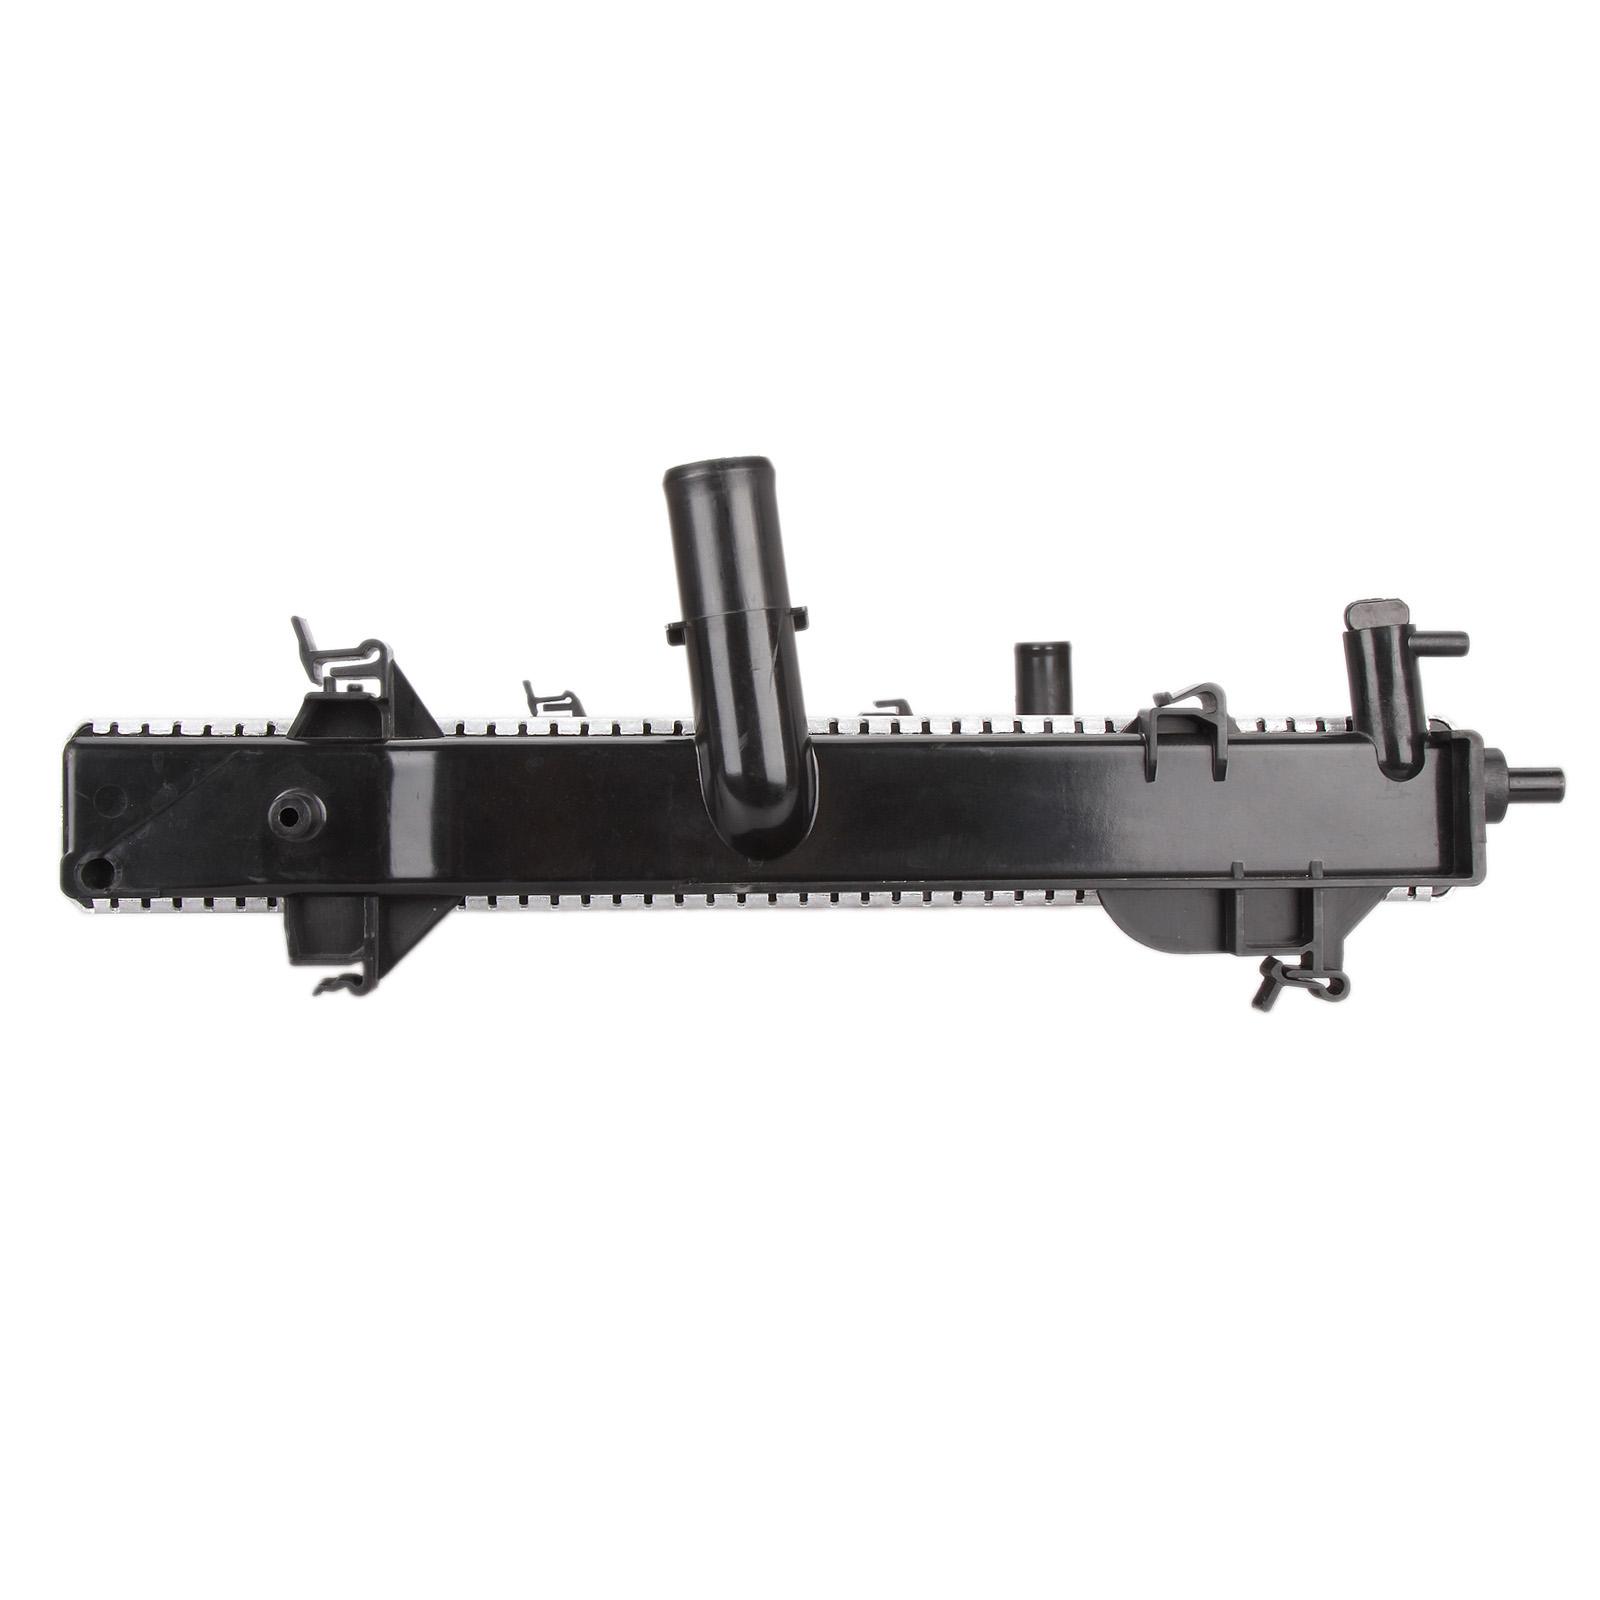 32mm hsv engine holden radiator Dromedary Brand company